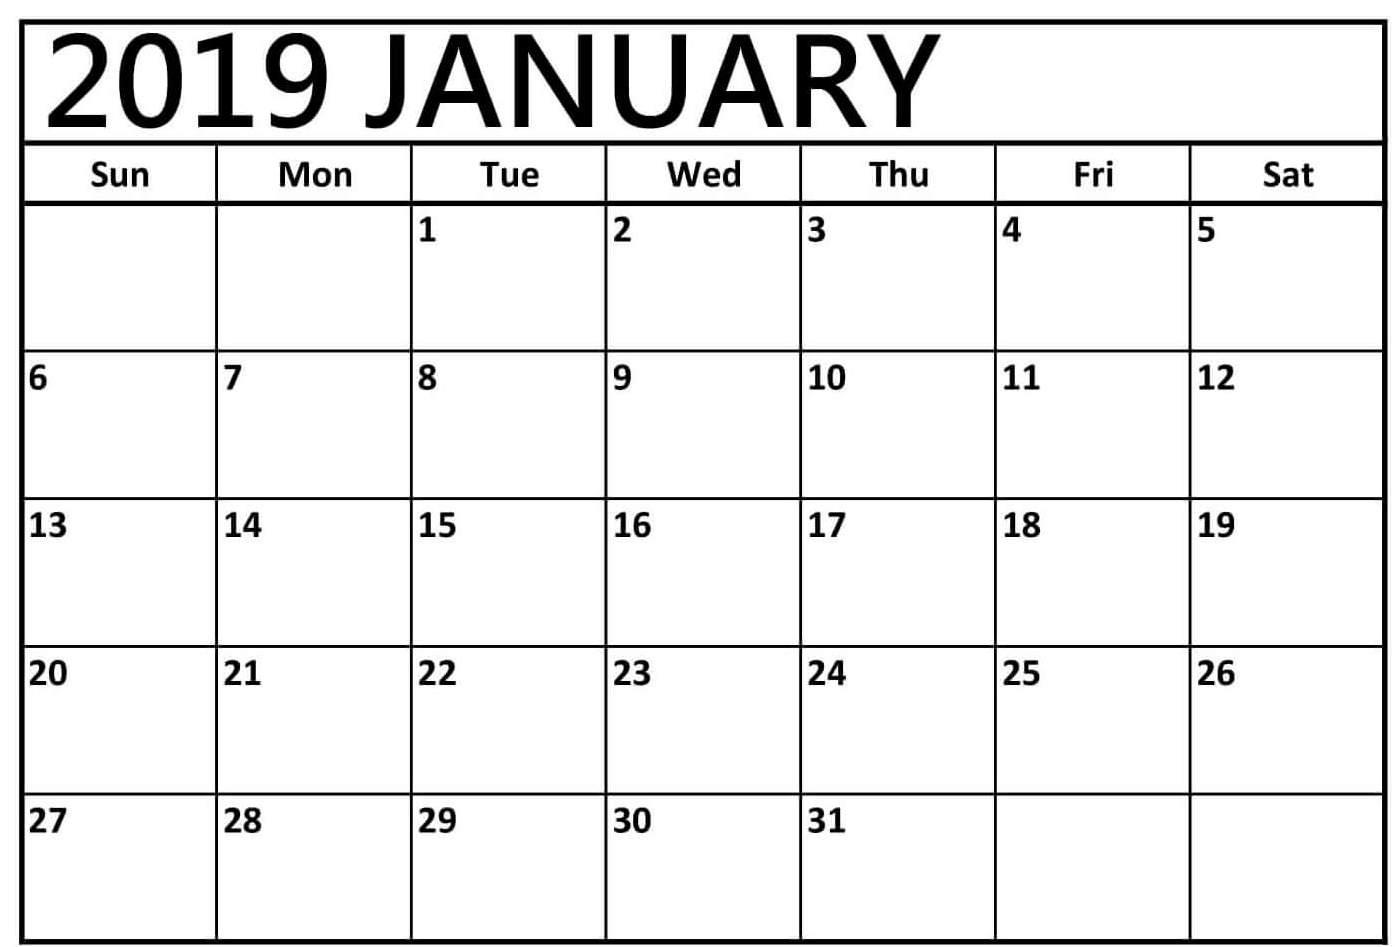 Blank Monthly Calendar January 2019